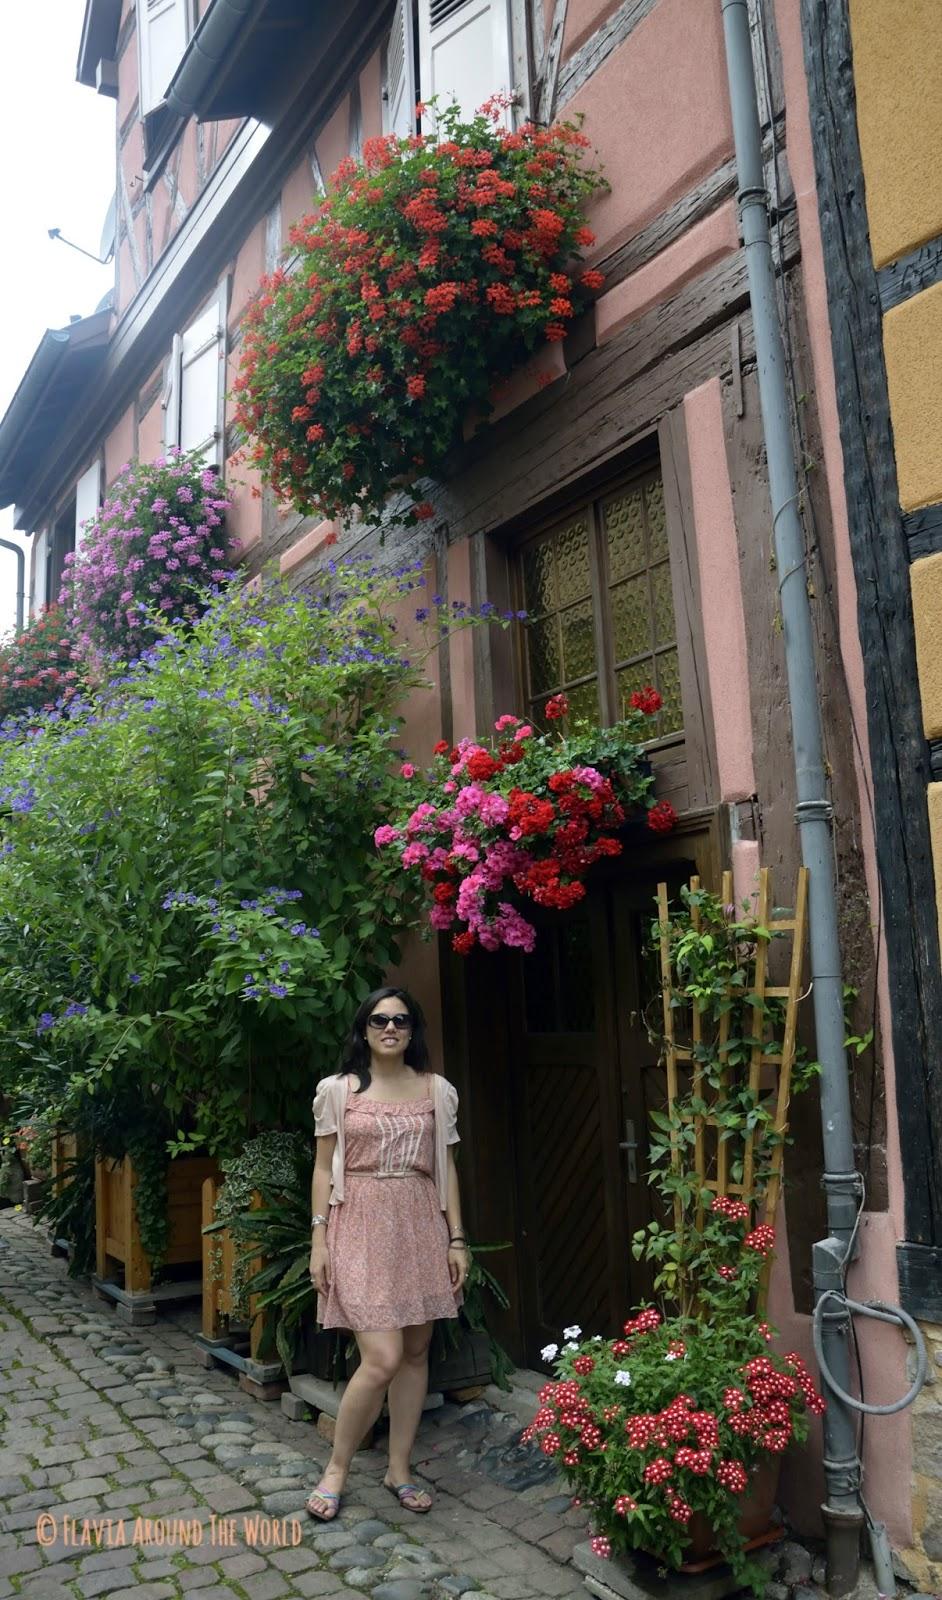 Casa muy florida de Eguisheim